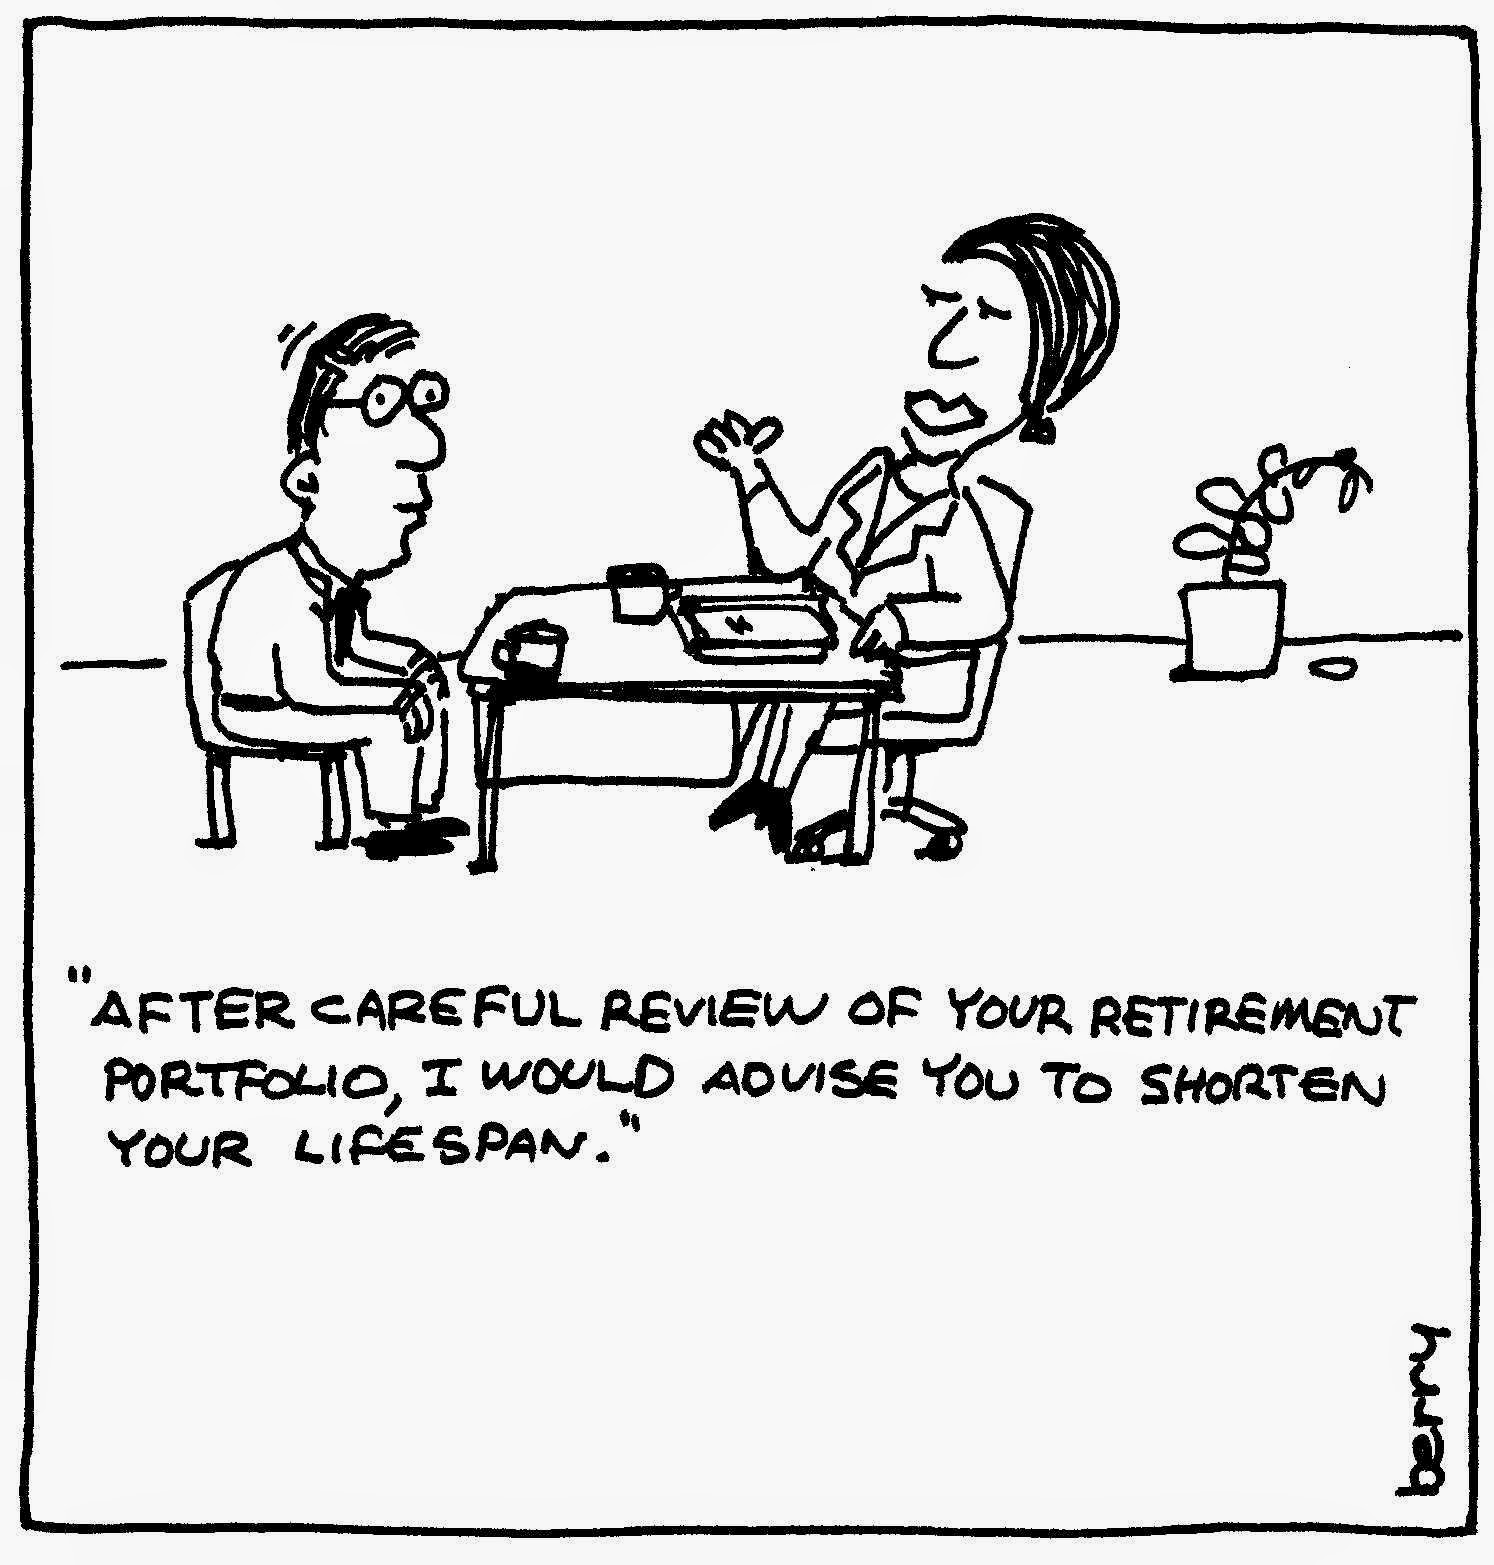 Free Comic Book Day Romania: Berry Cartoons: Retirement Plan Cartoon